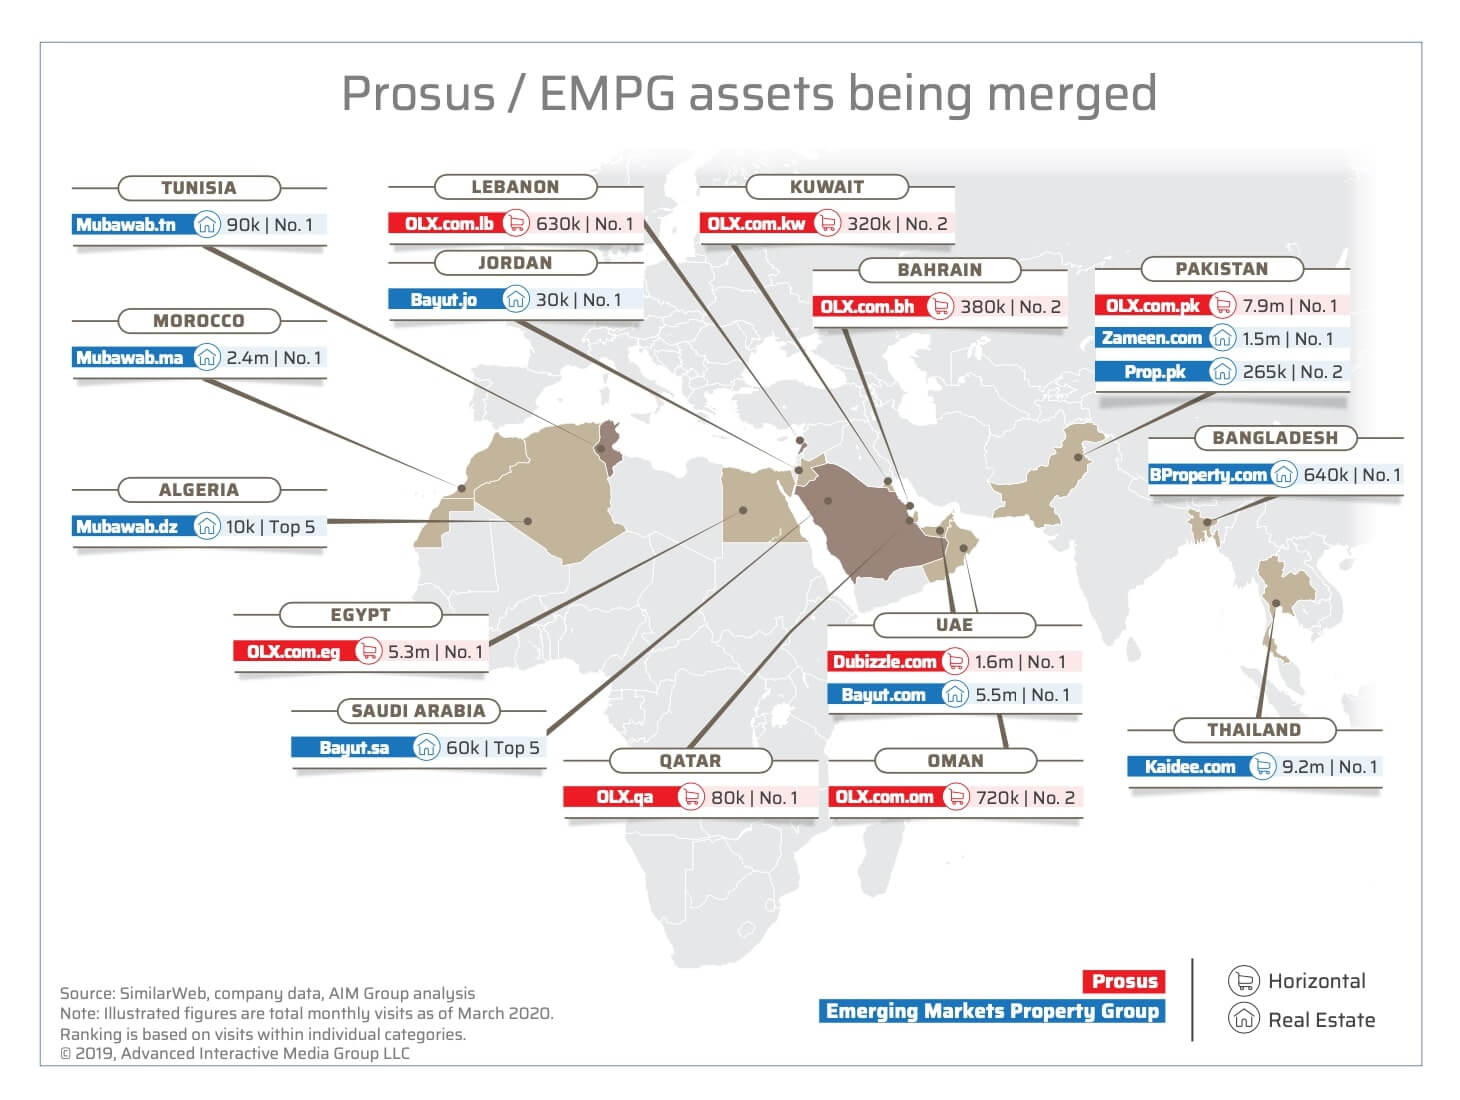 Emerging Markets Property Group (EMPG)